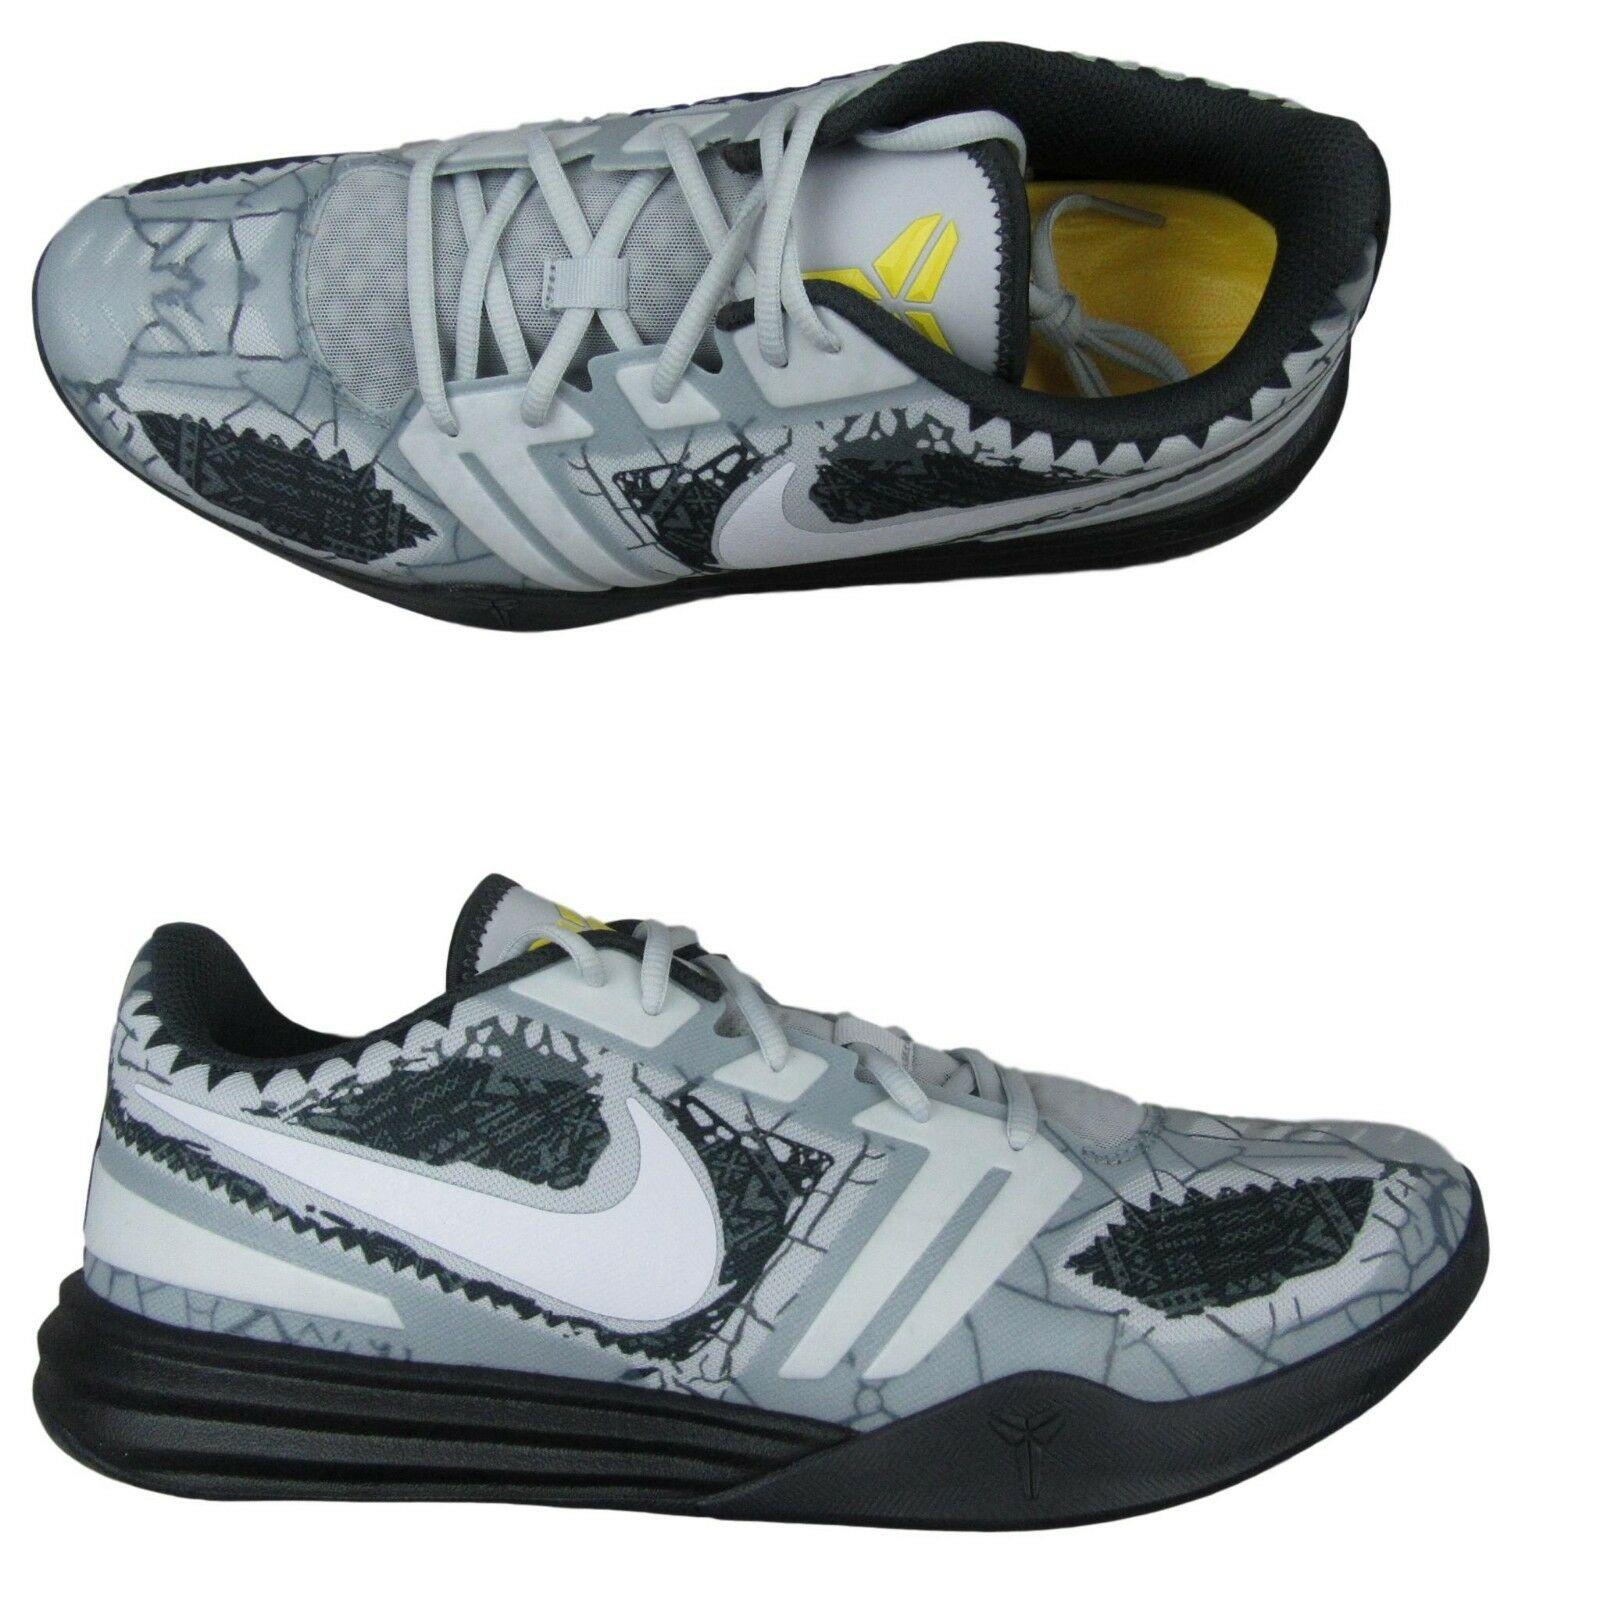 51046de7ff2 Nike Kobe Mentality Cracked Pavement Basketball Shoes Size 13 Grey ...